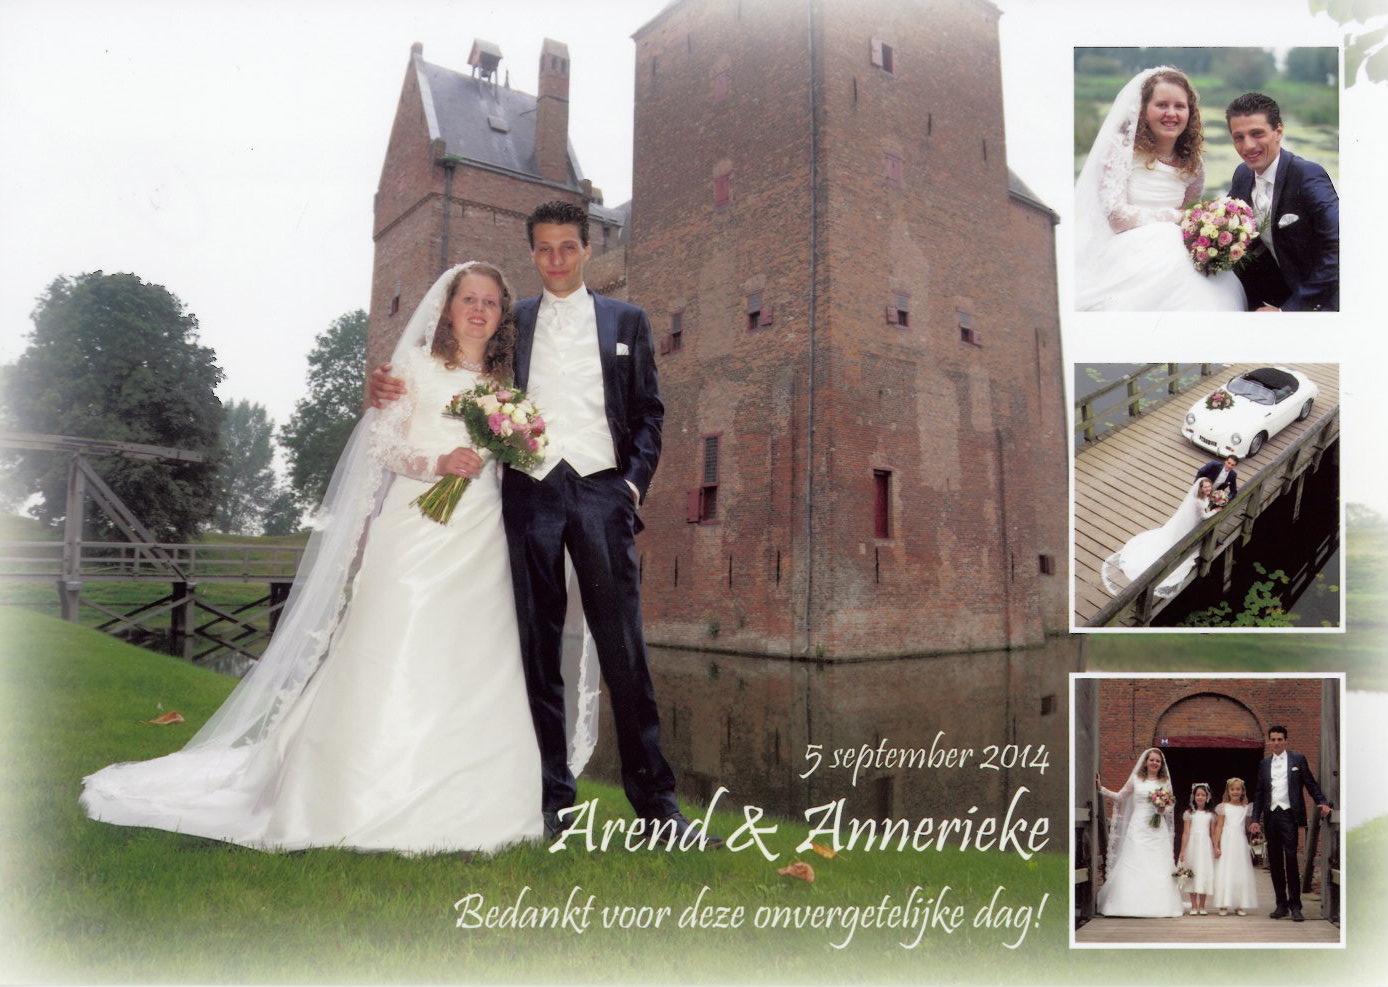 bruidspaar Stefan v.d. Waal - Kim Hermenet (05-09-2014)